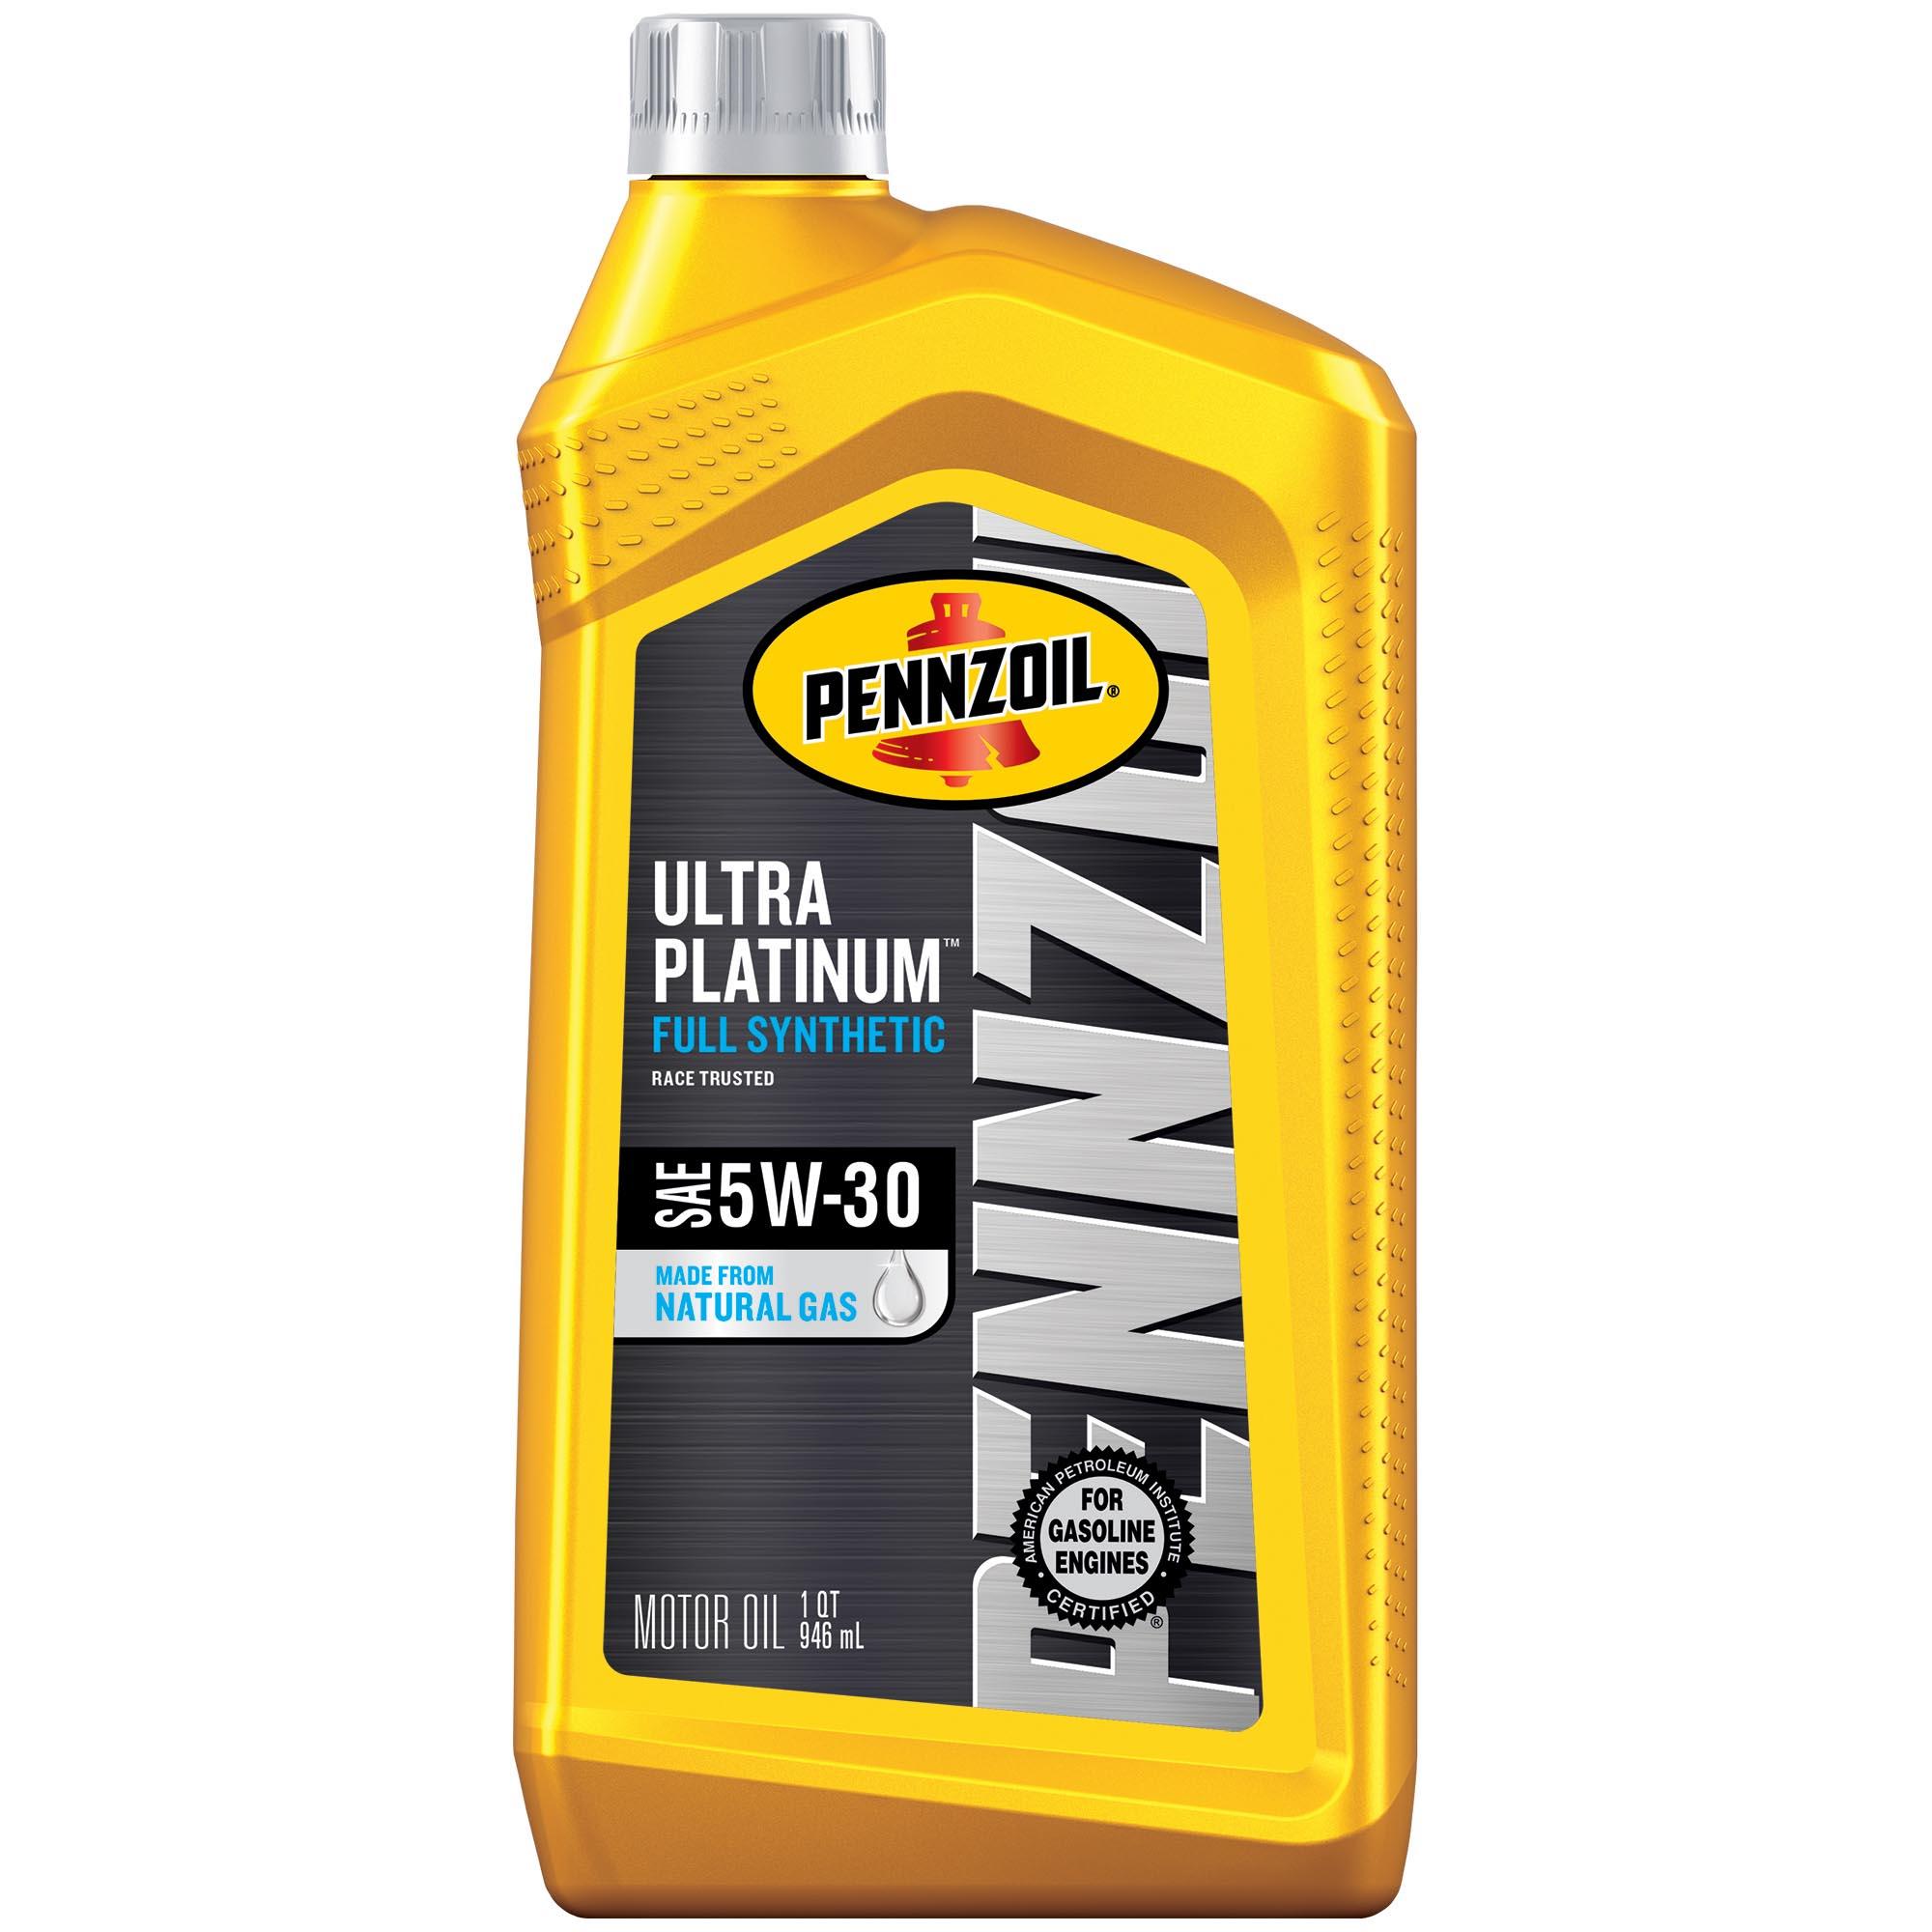 Pennzoil超铂全合成5W-30机油